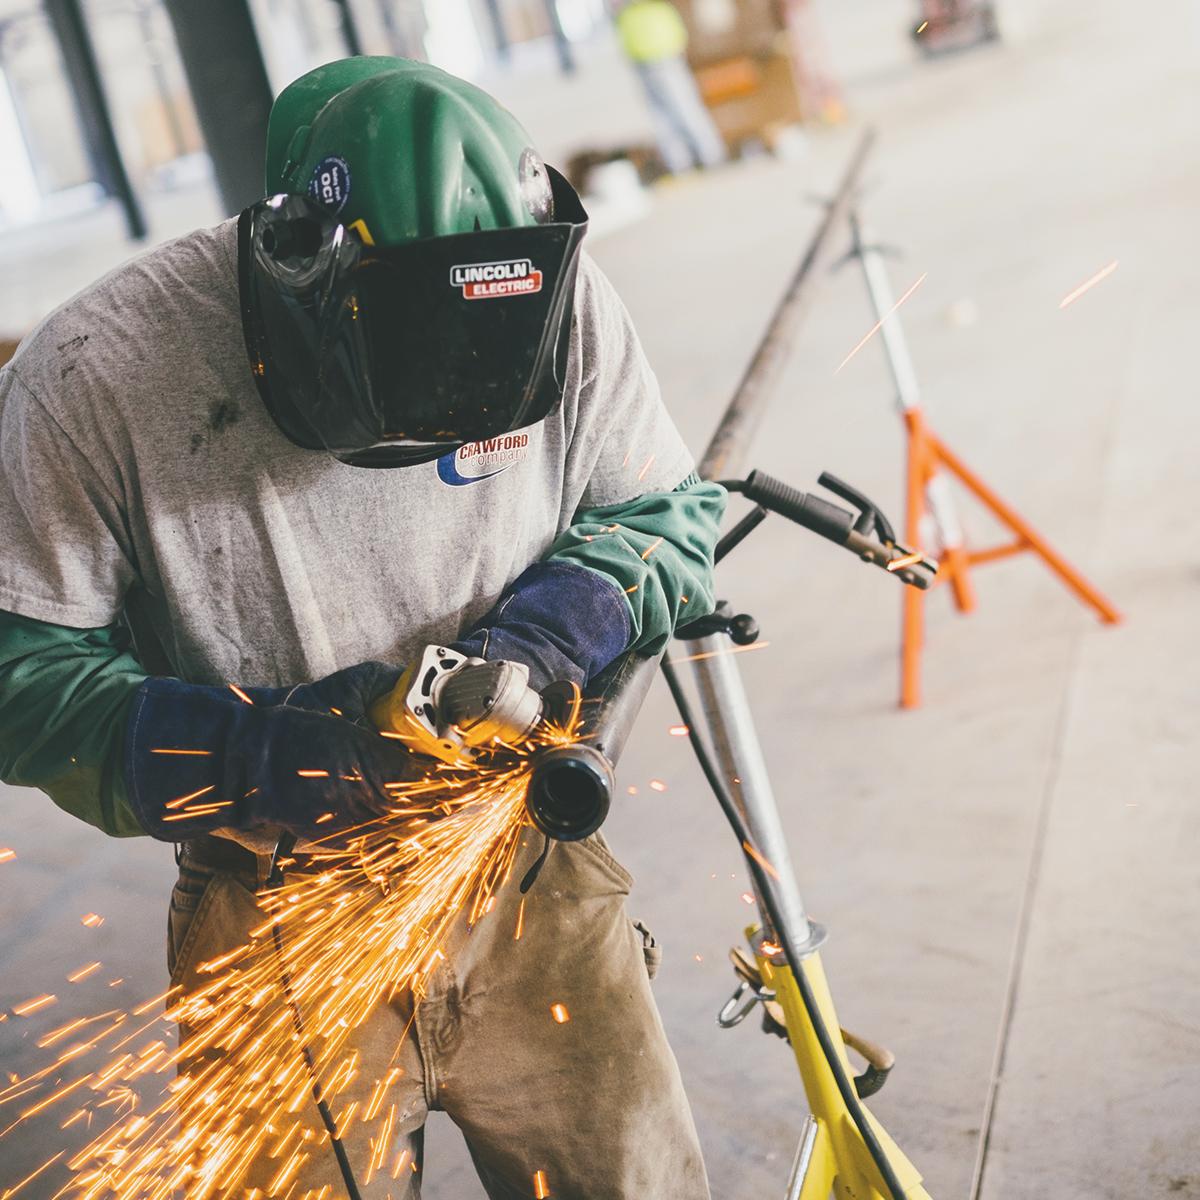 Crawford welding